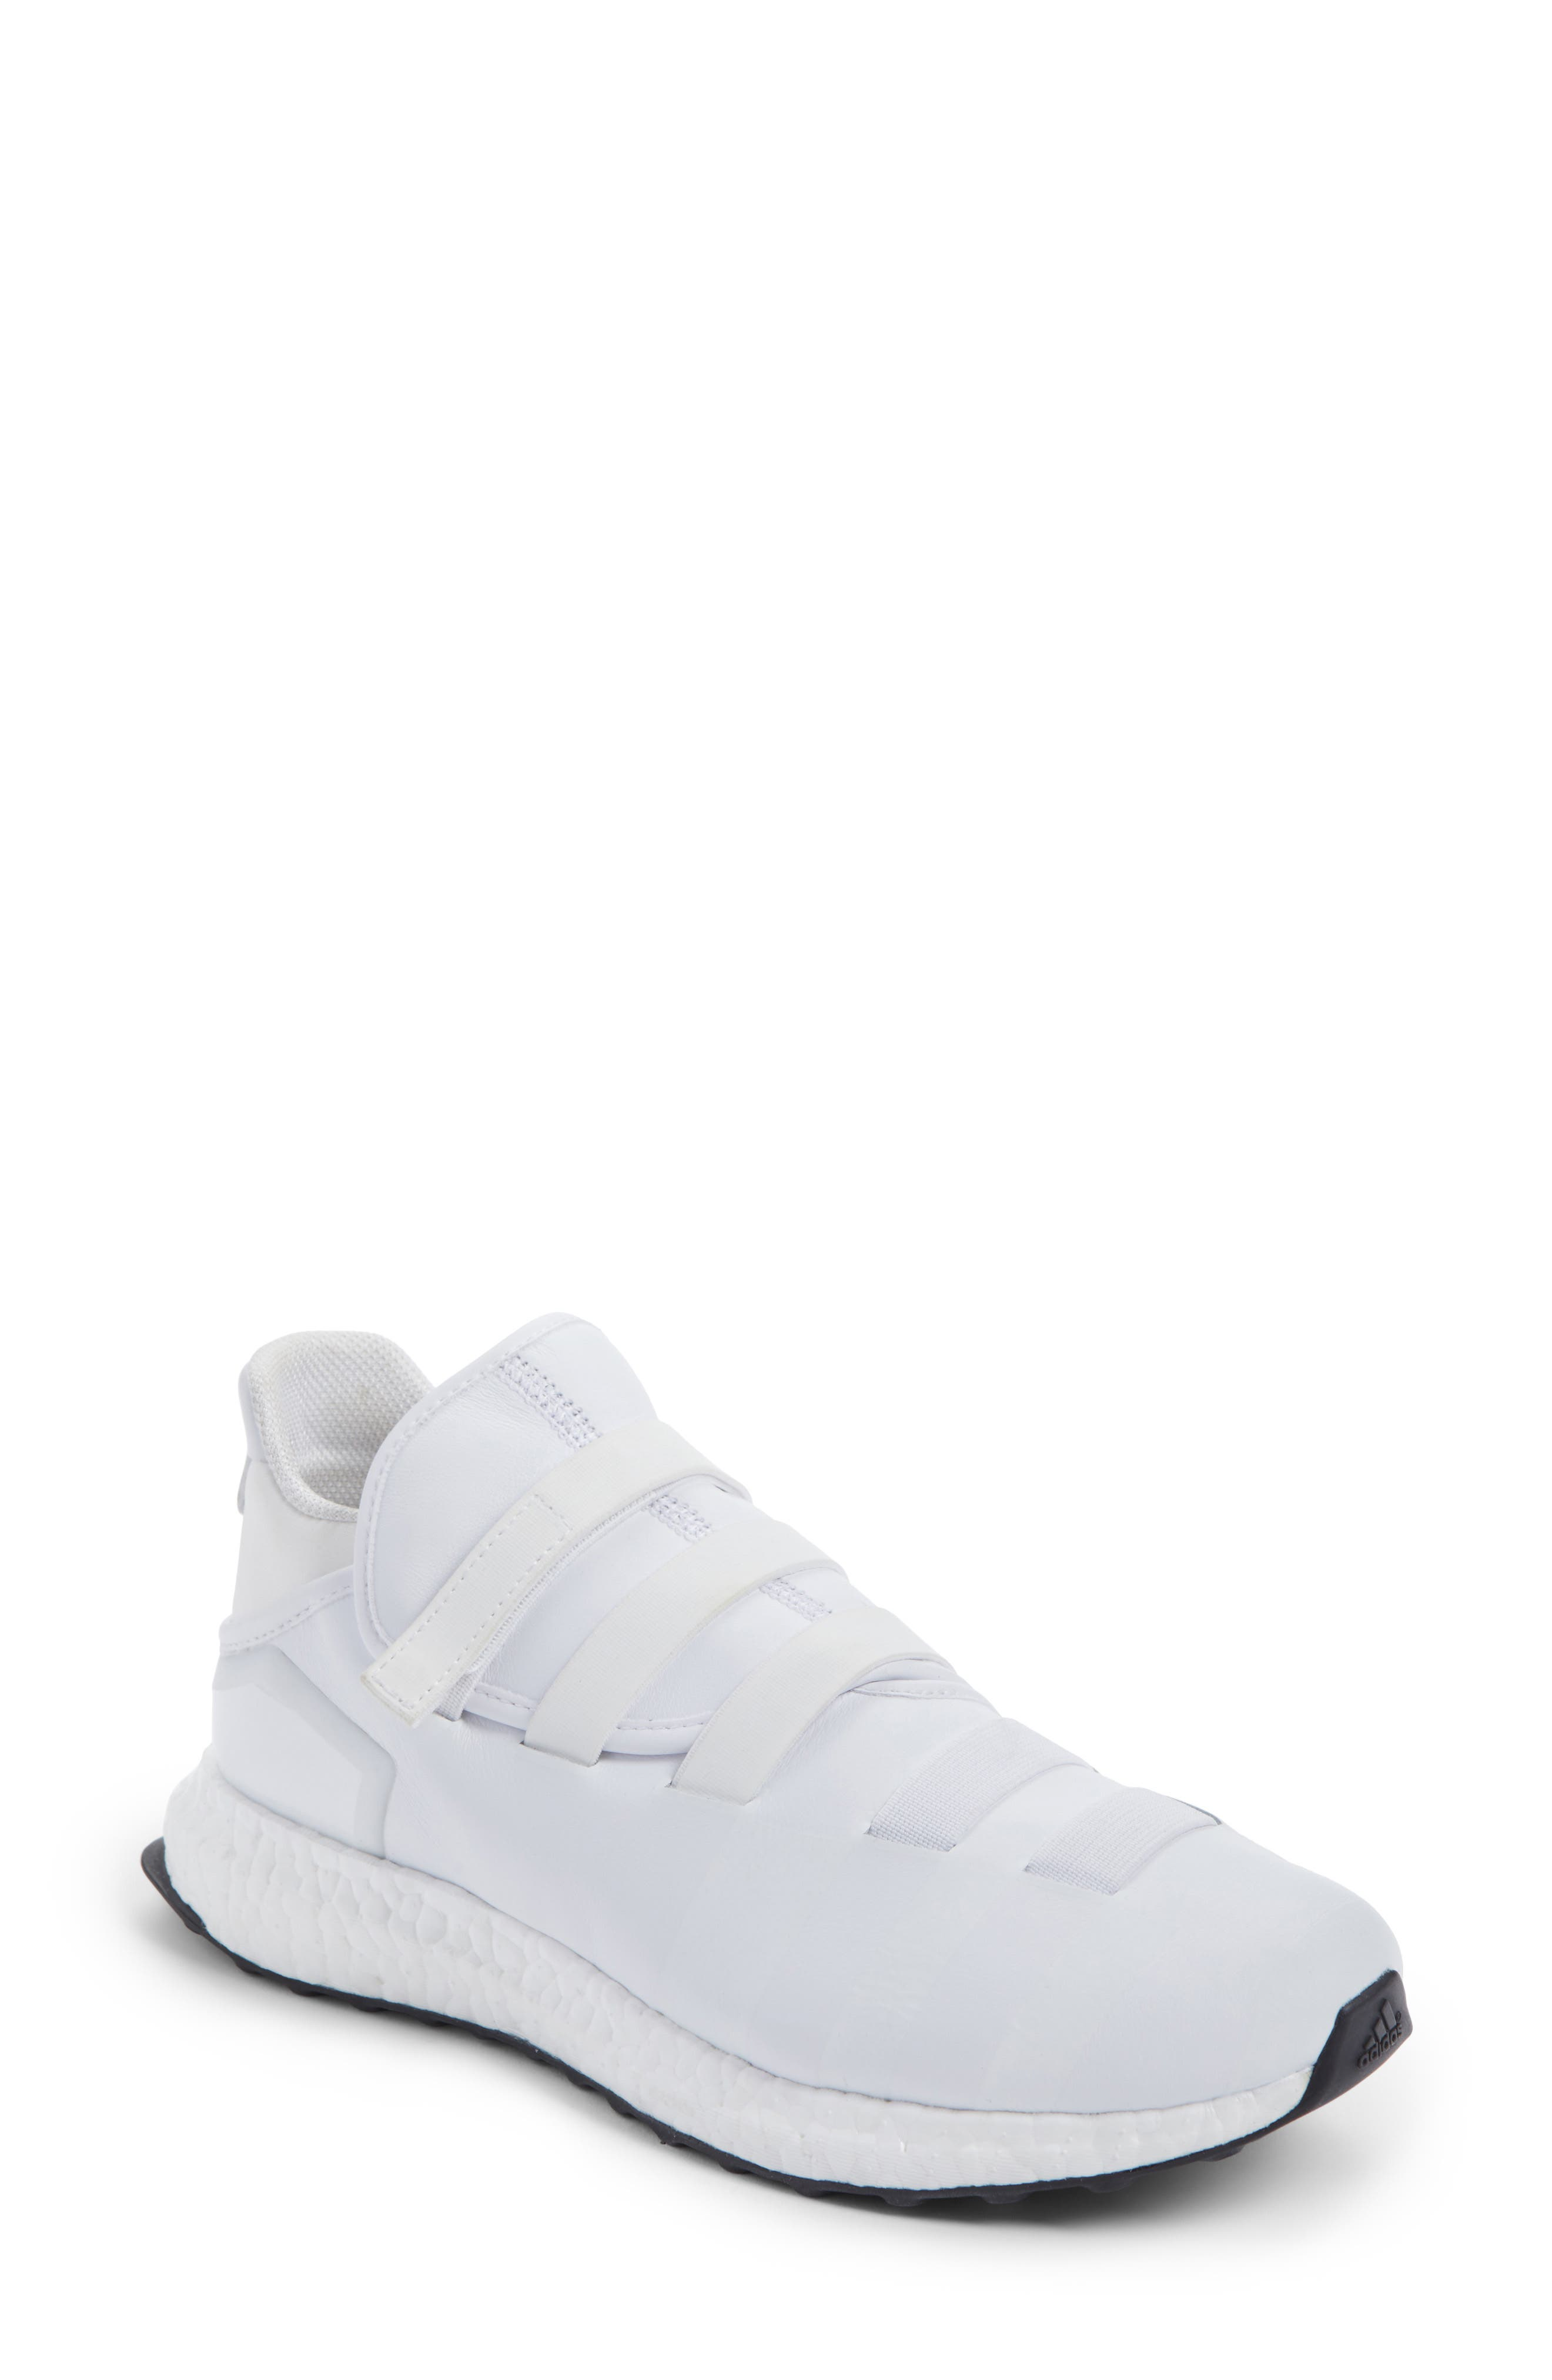 Zazu Strappy Sneaker,                             Main thumbnail 1, color,                             100